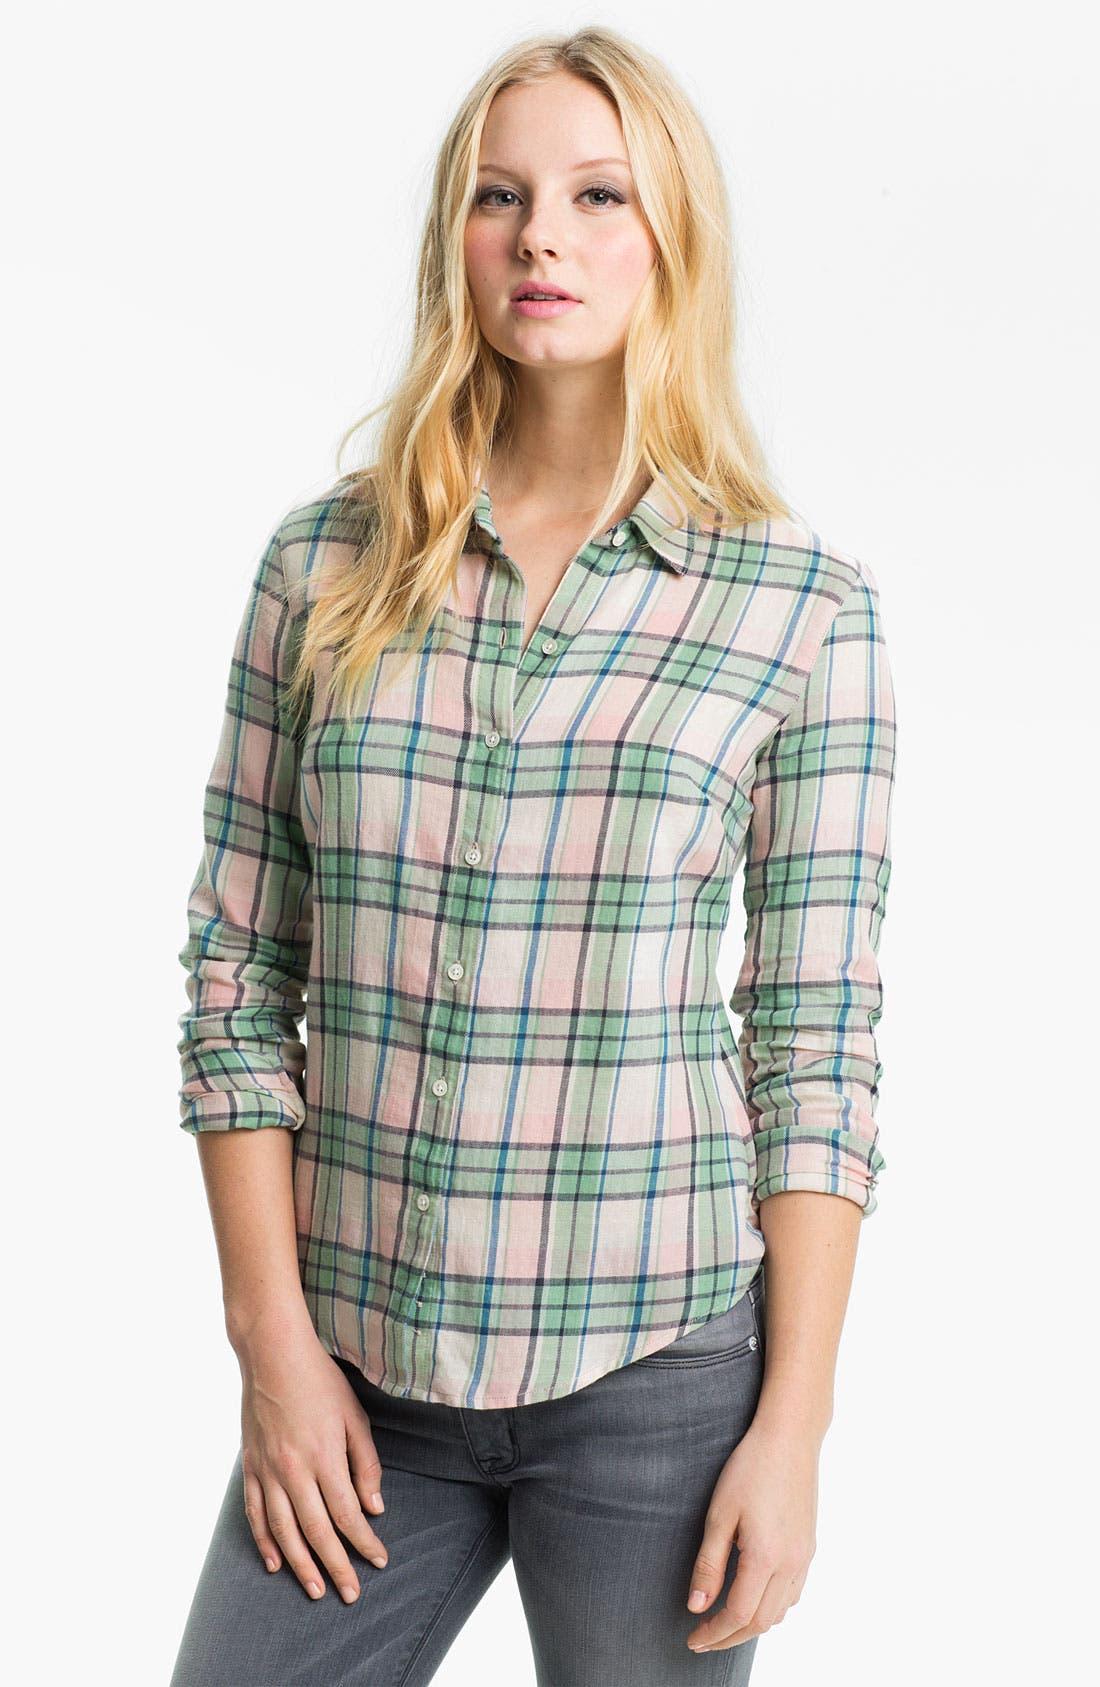 Alternate Image 1 Selected - James Perse 'Sail' Plaid Shirt